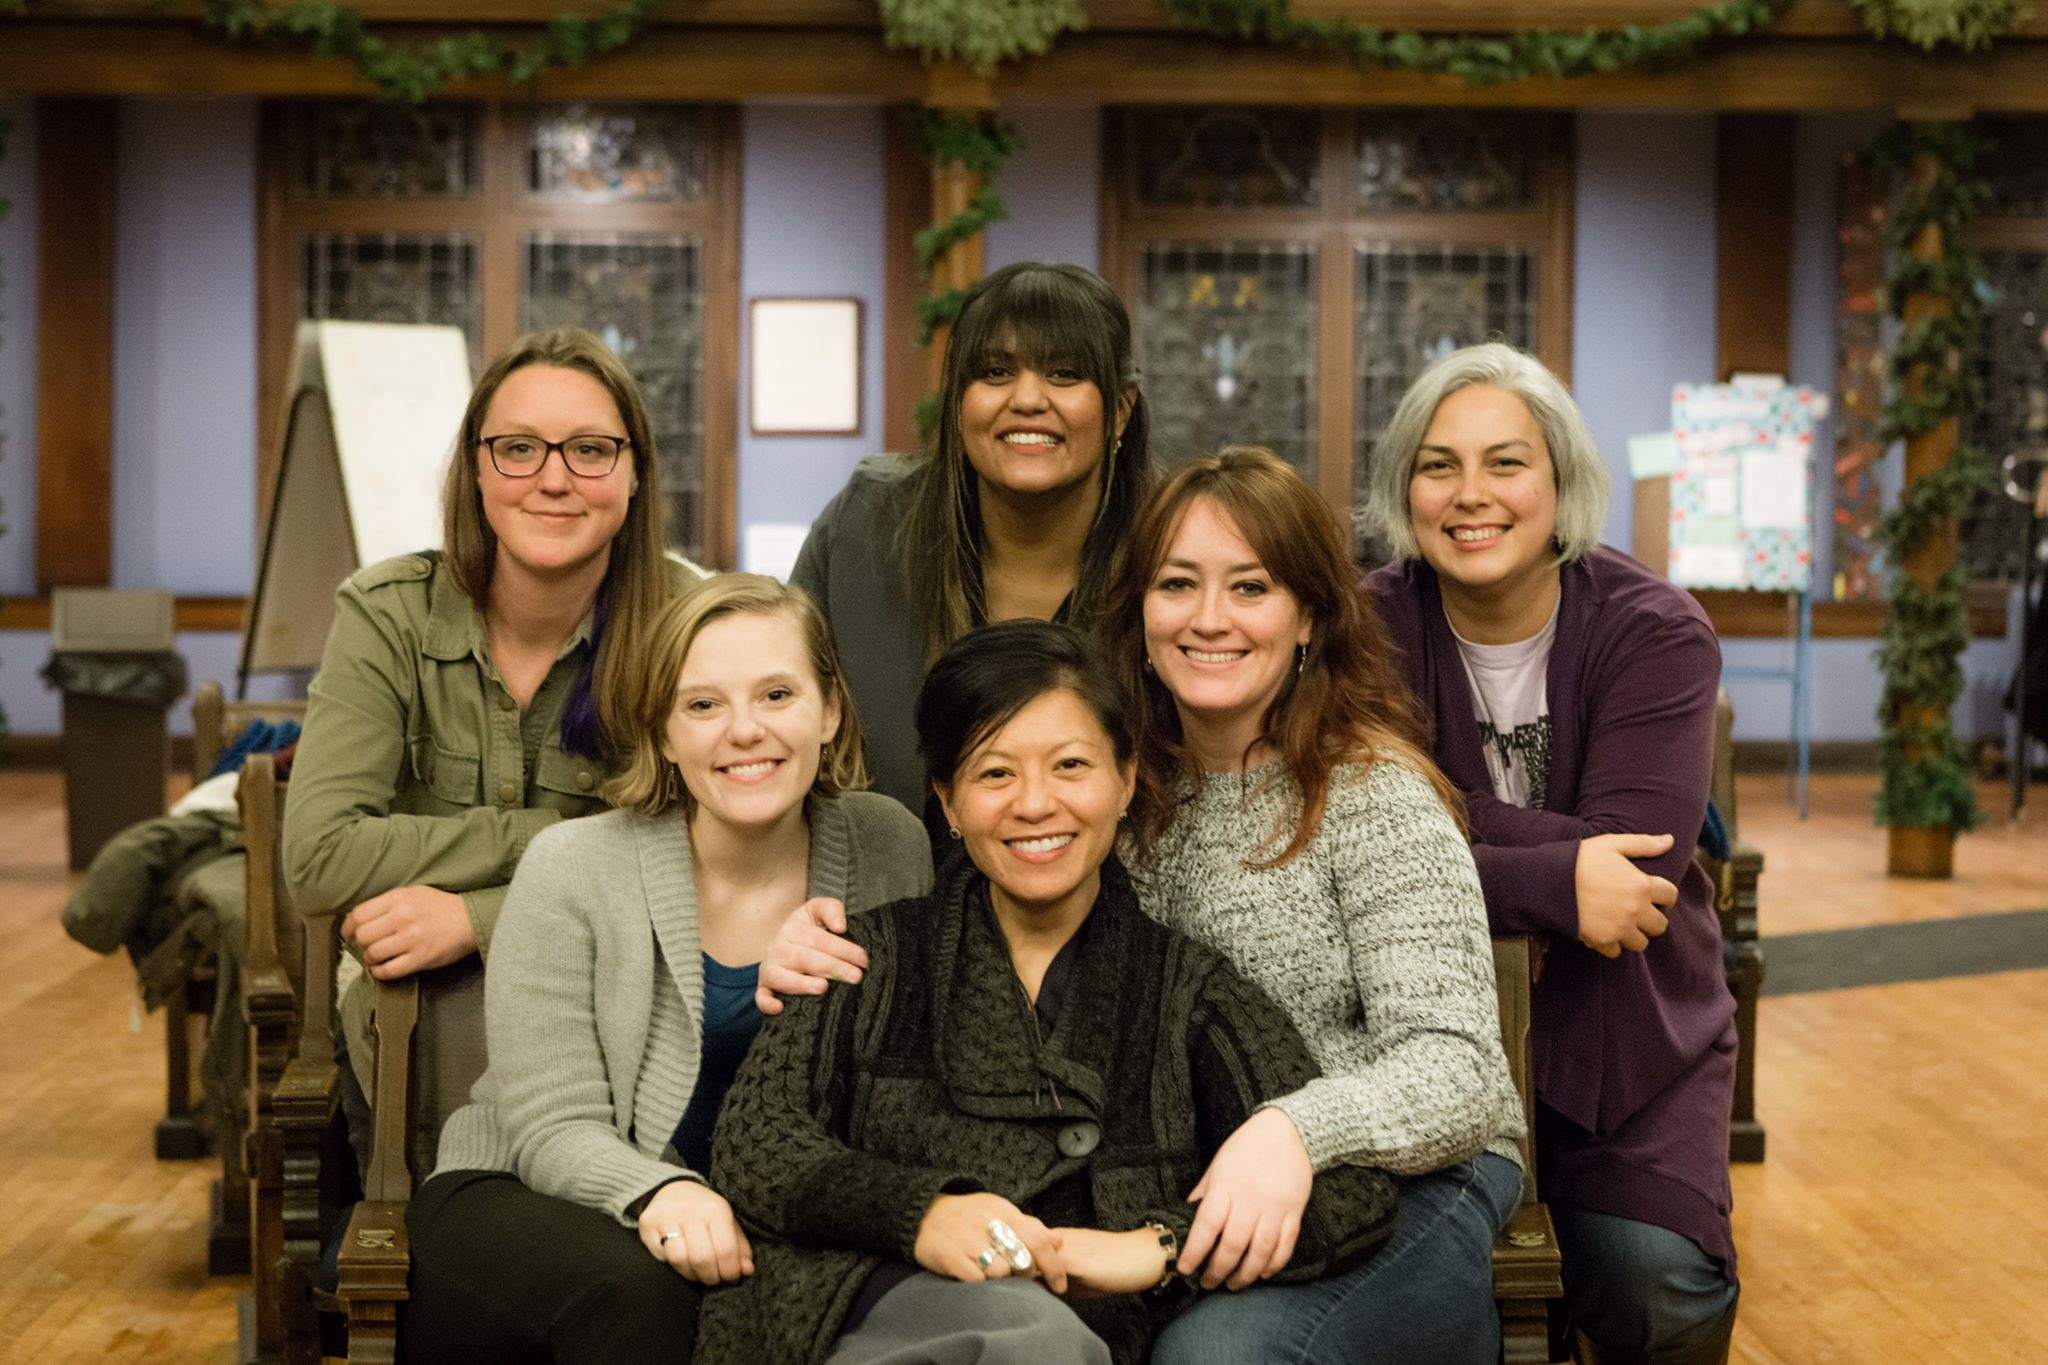 The Women's March on Washington - Illinois Chapter State Team, from right to left: Julie, Amanda Jane, Mrinalini, Leni, Amber, and Amanda.